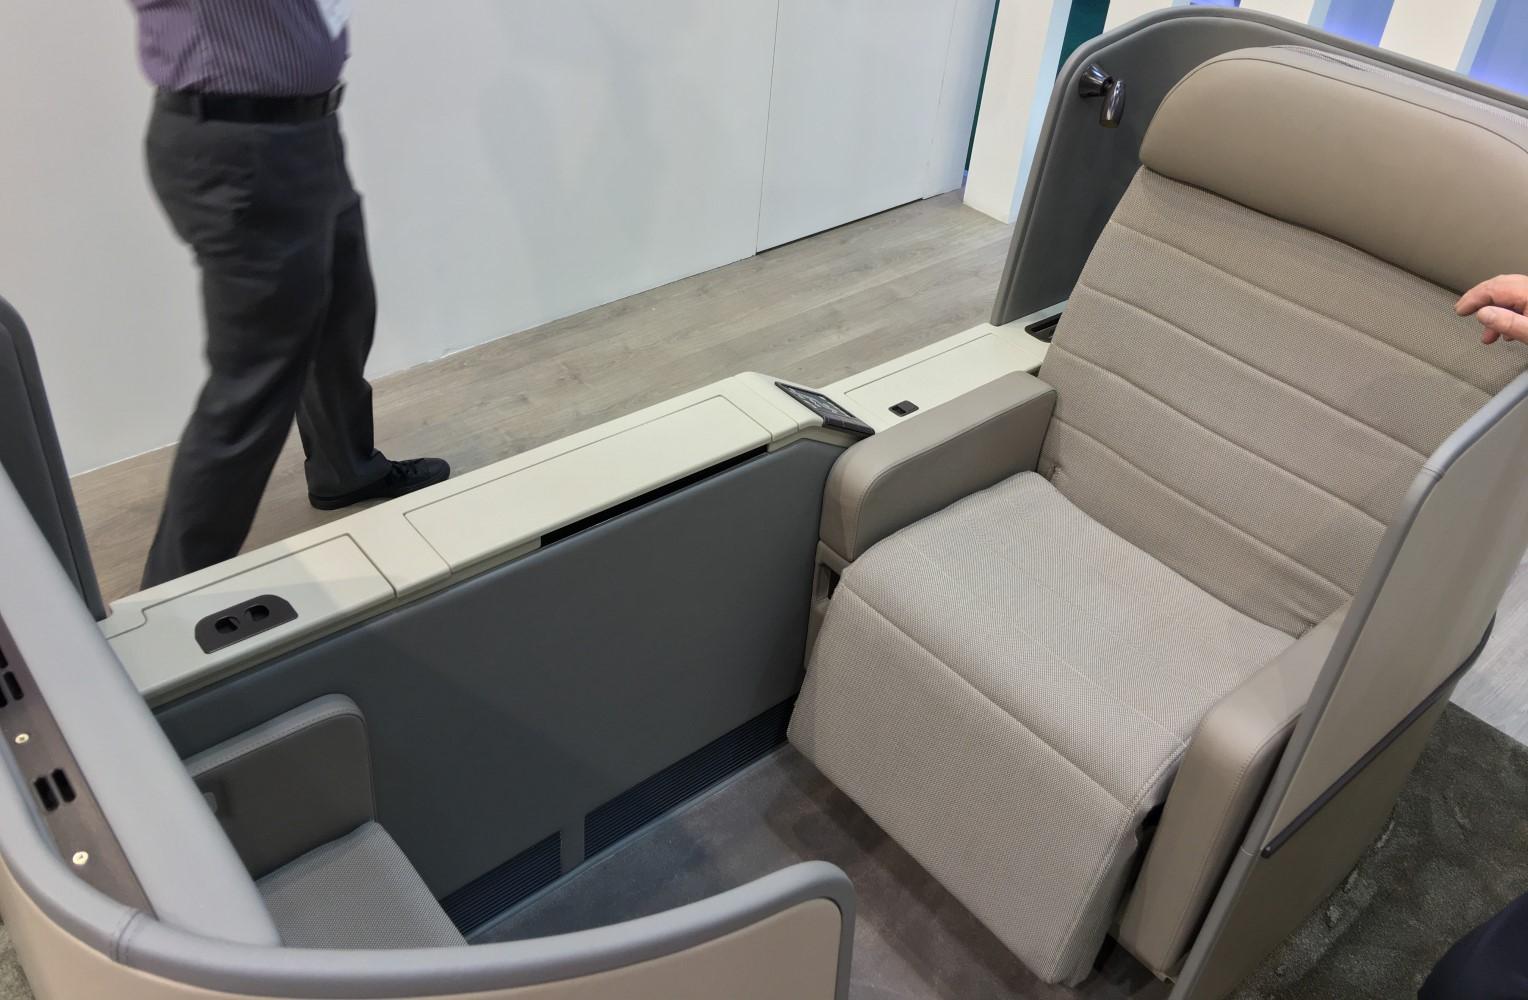 Aiointeriors current flagship is the Mona Lisa first class seat. Image: John Walton